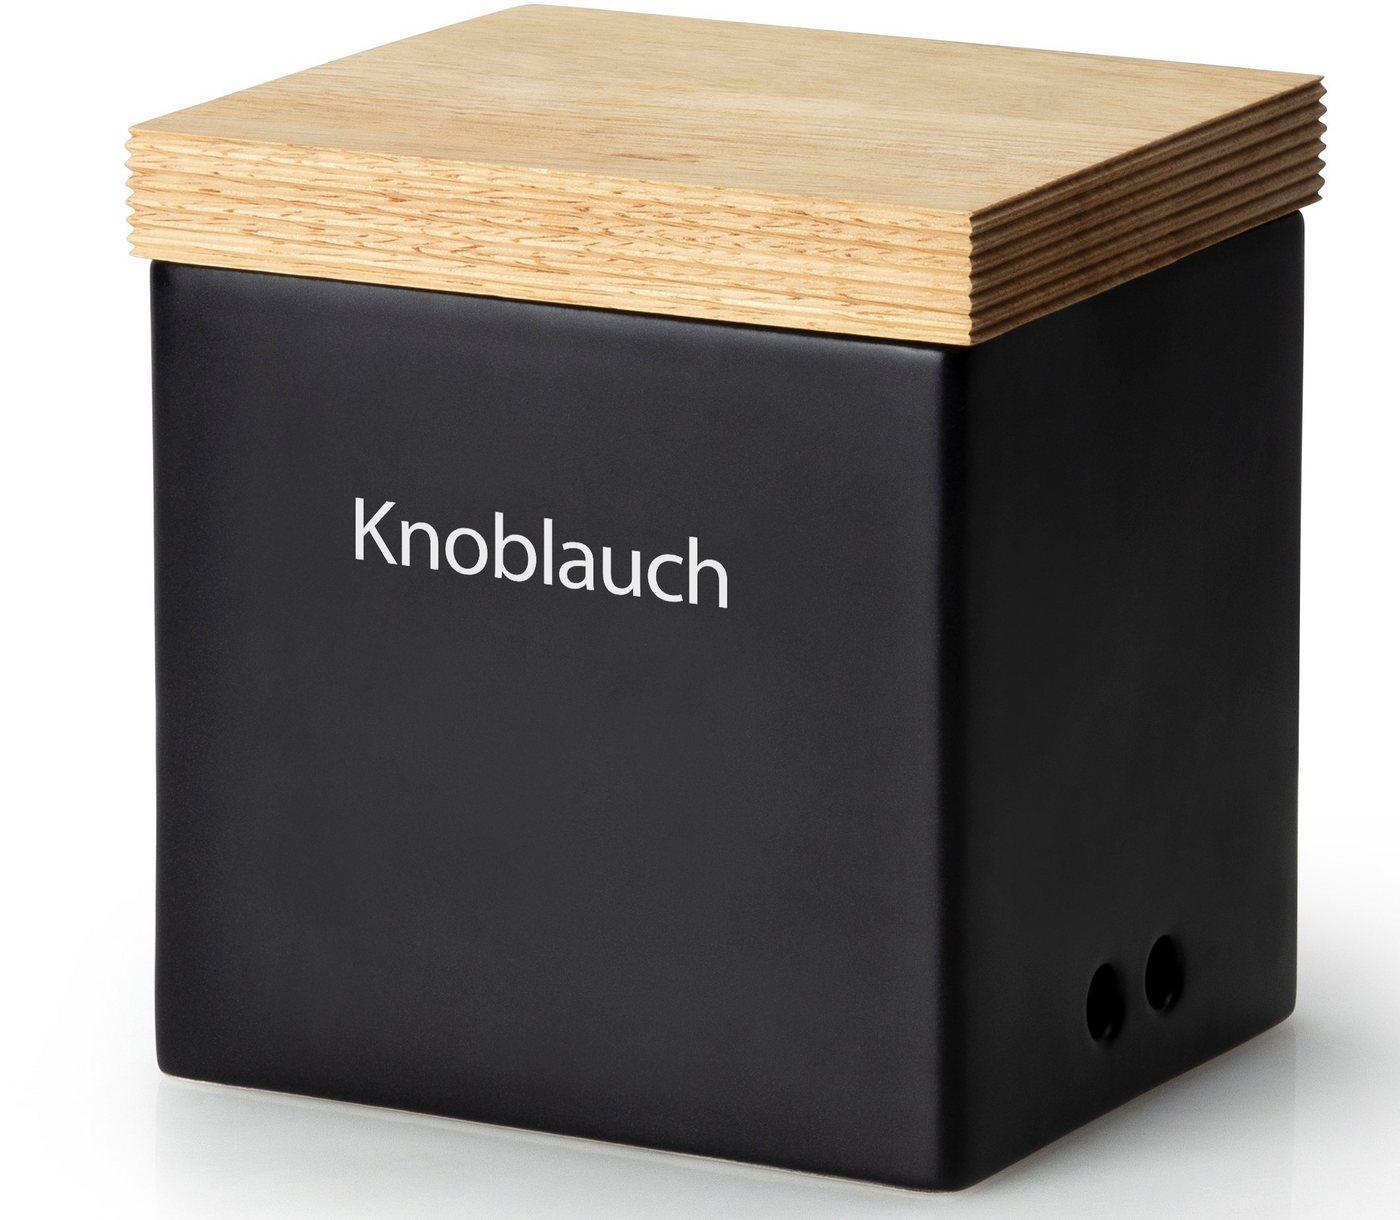 Continenta Vorratsdose, Keramik, Holz, (1-tlg), Knoblauchtopf